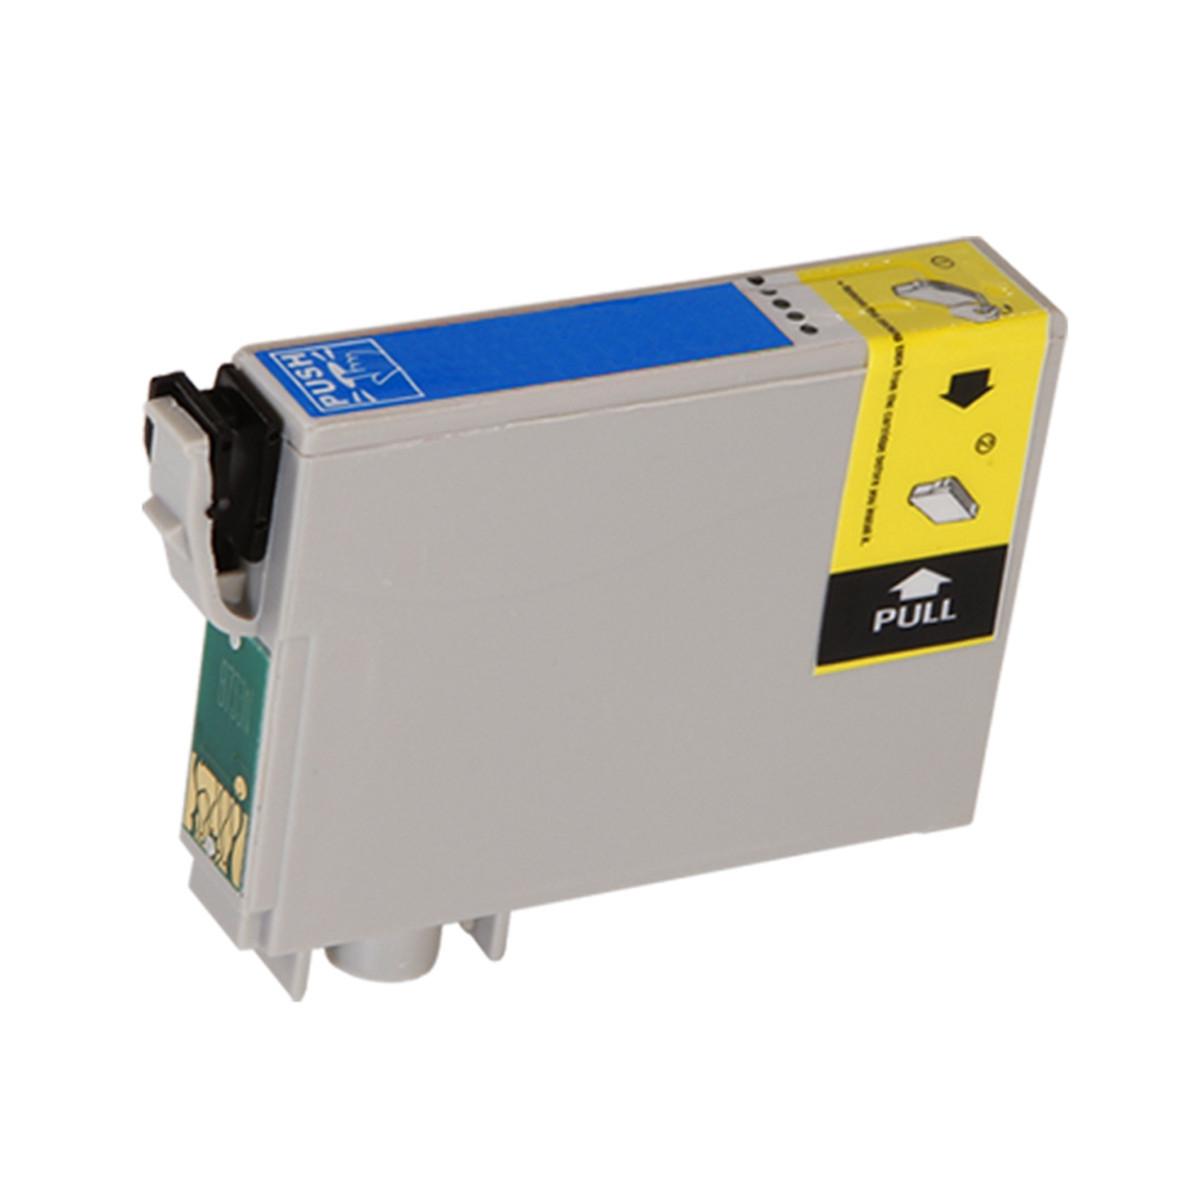 Cartucho de Tinta Epson T063220 T0632 T063 Ciano | CX7700 C87 CX3700 C67 | Compatível 12 ml